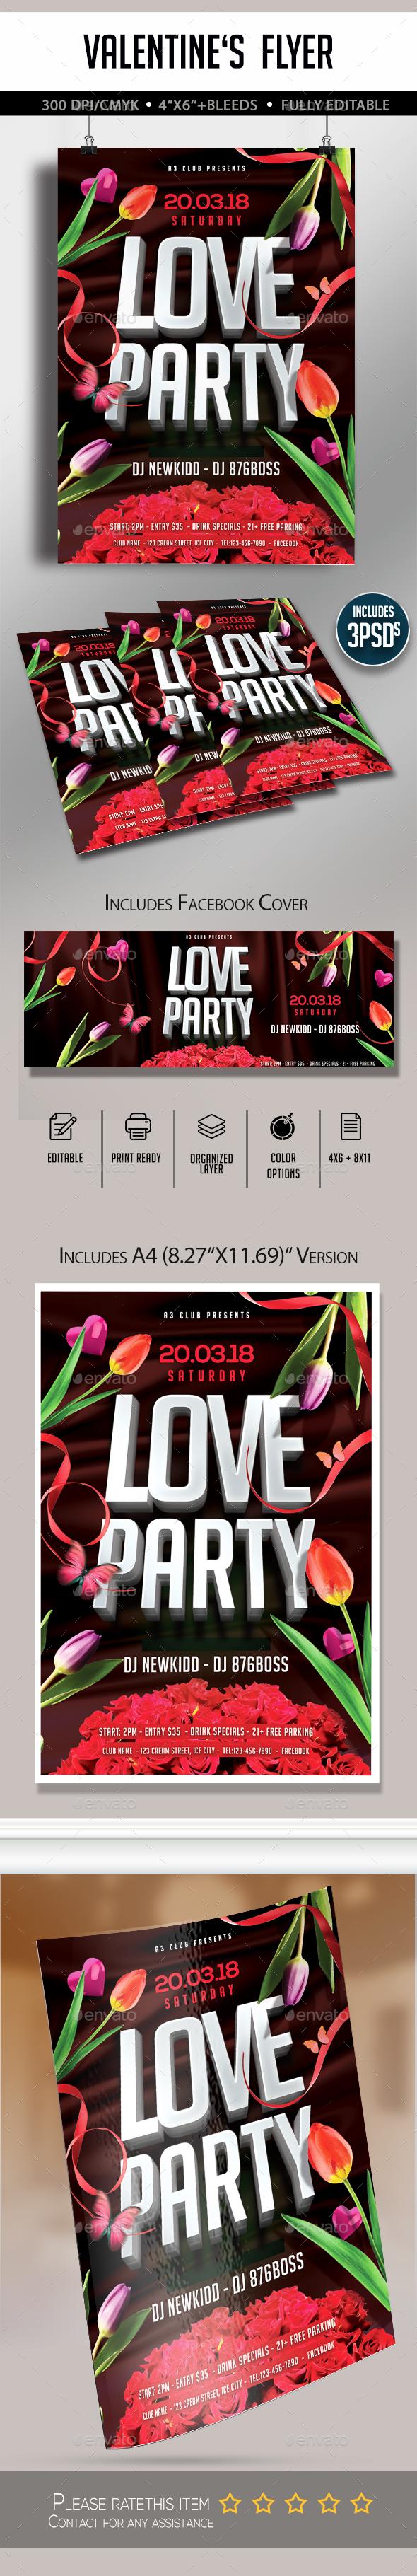 Valentine's Party Flyer - Flyers Print Templates